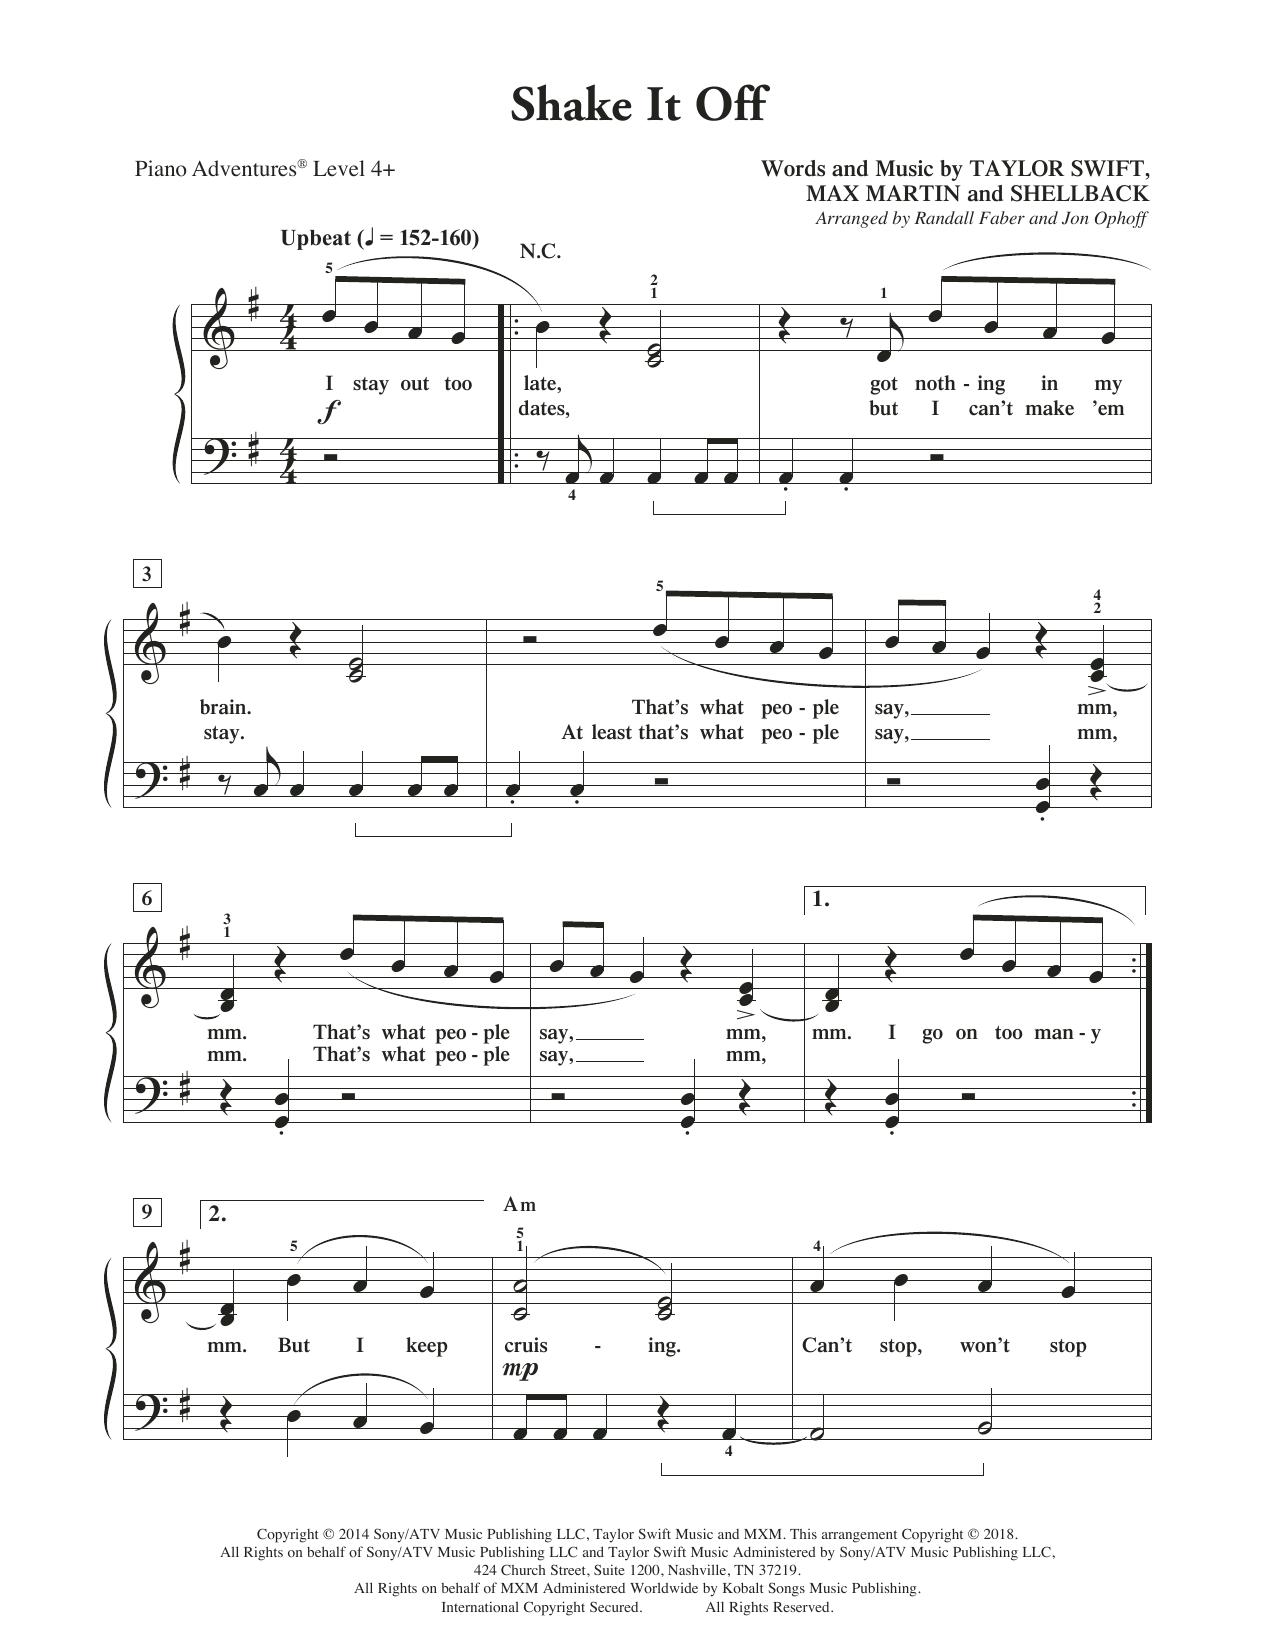 Shake It Off (Piano Adventures)